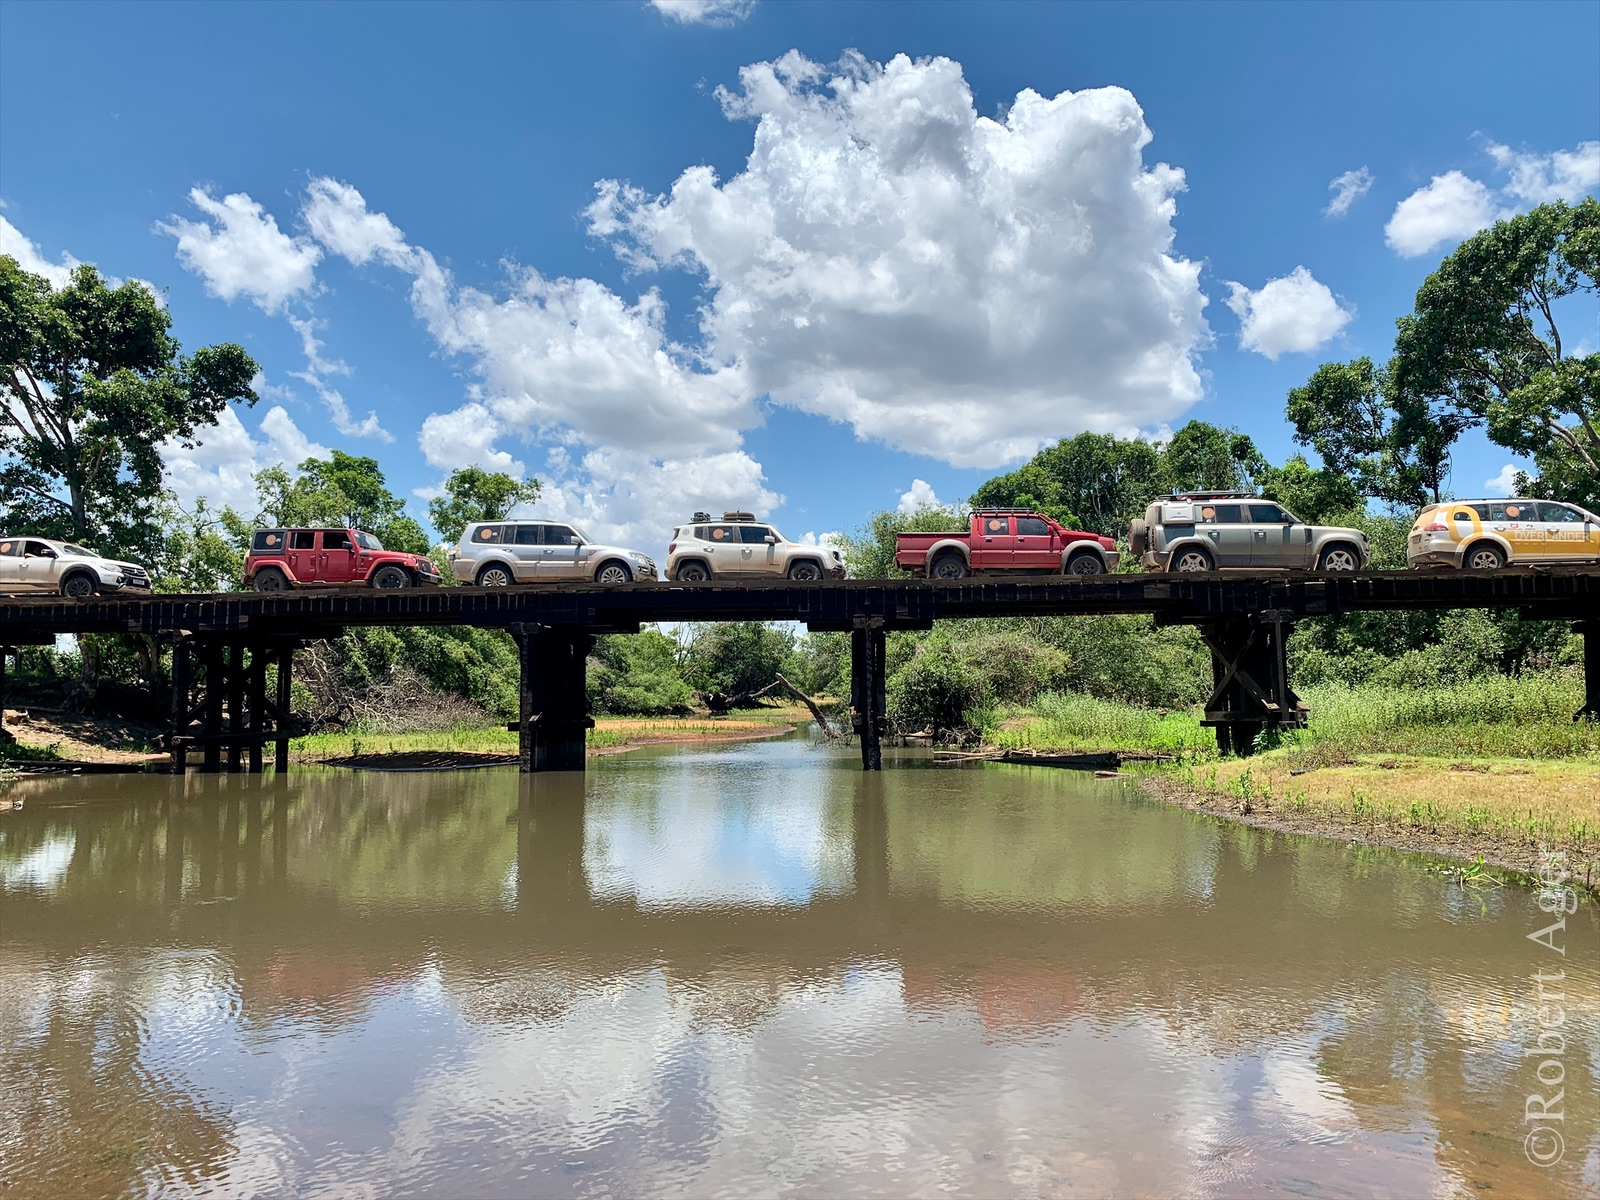 384_Overlander_Gaia_Pantanal